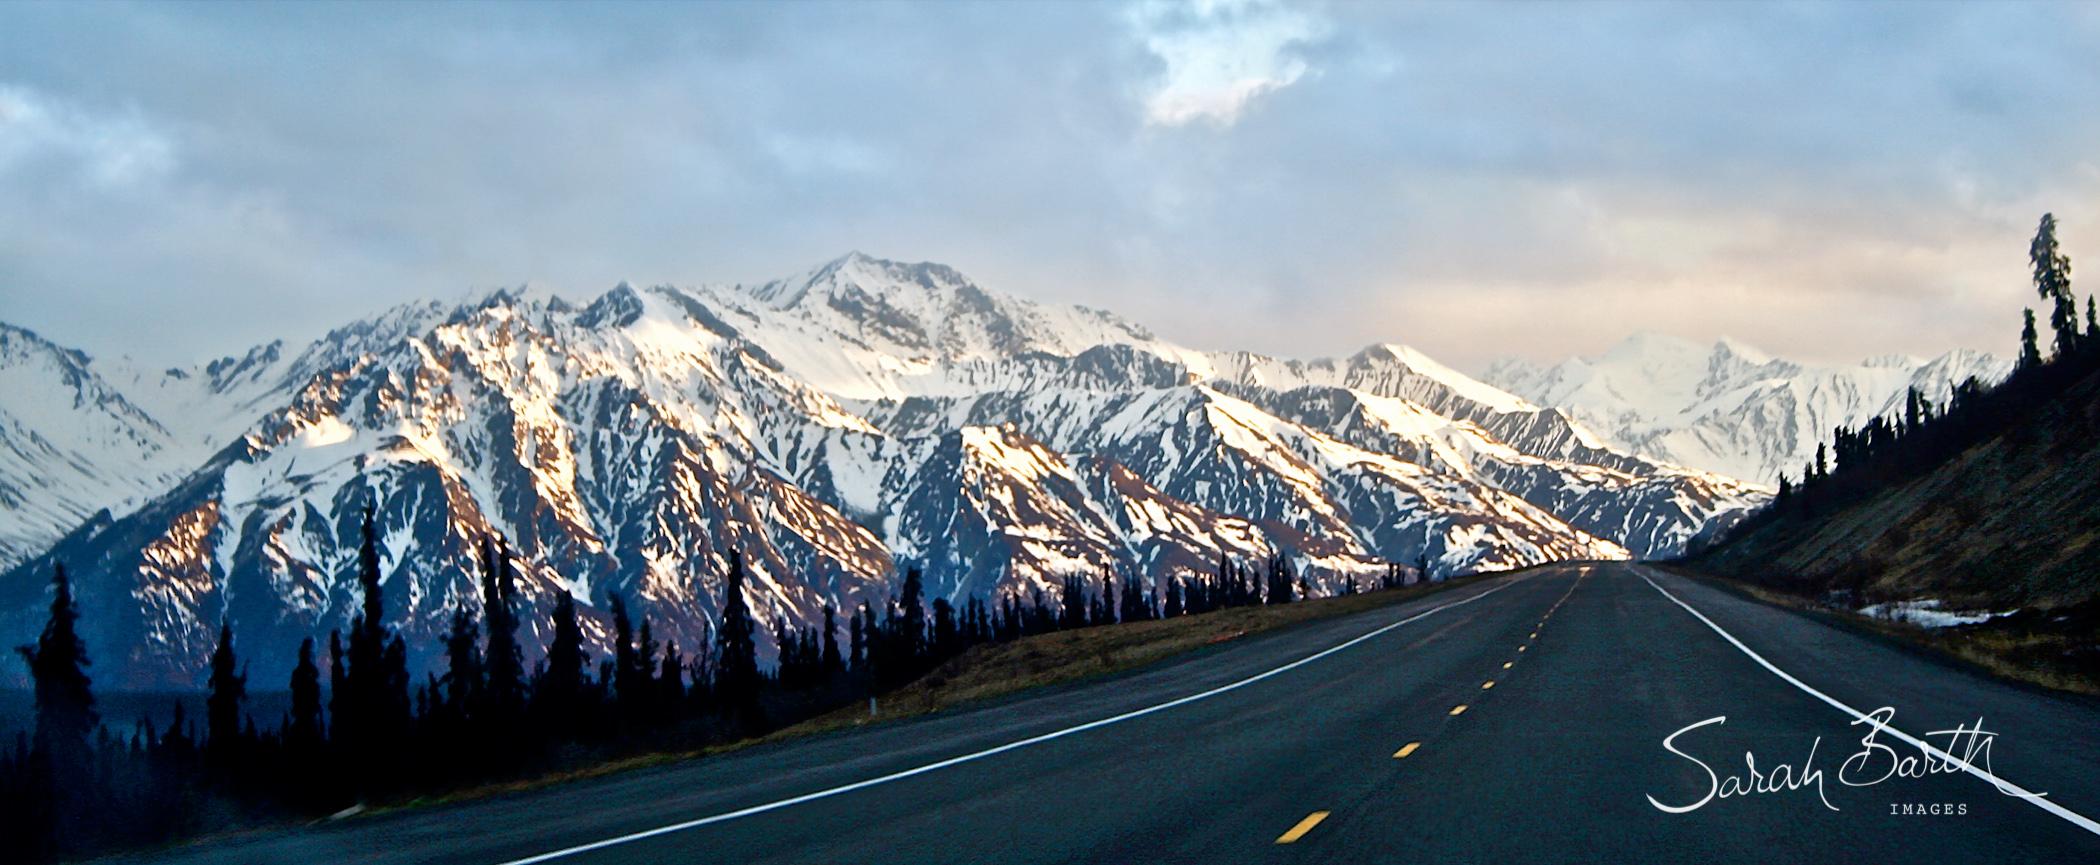 Alaska Bound_Low.jpg